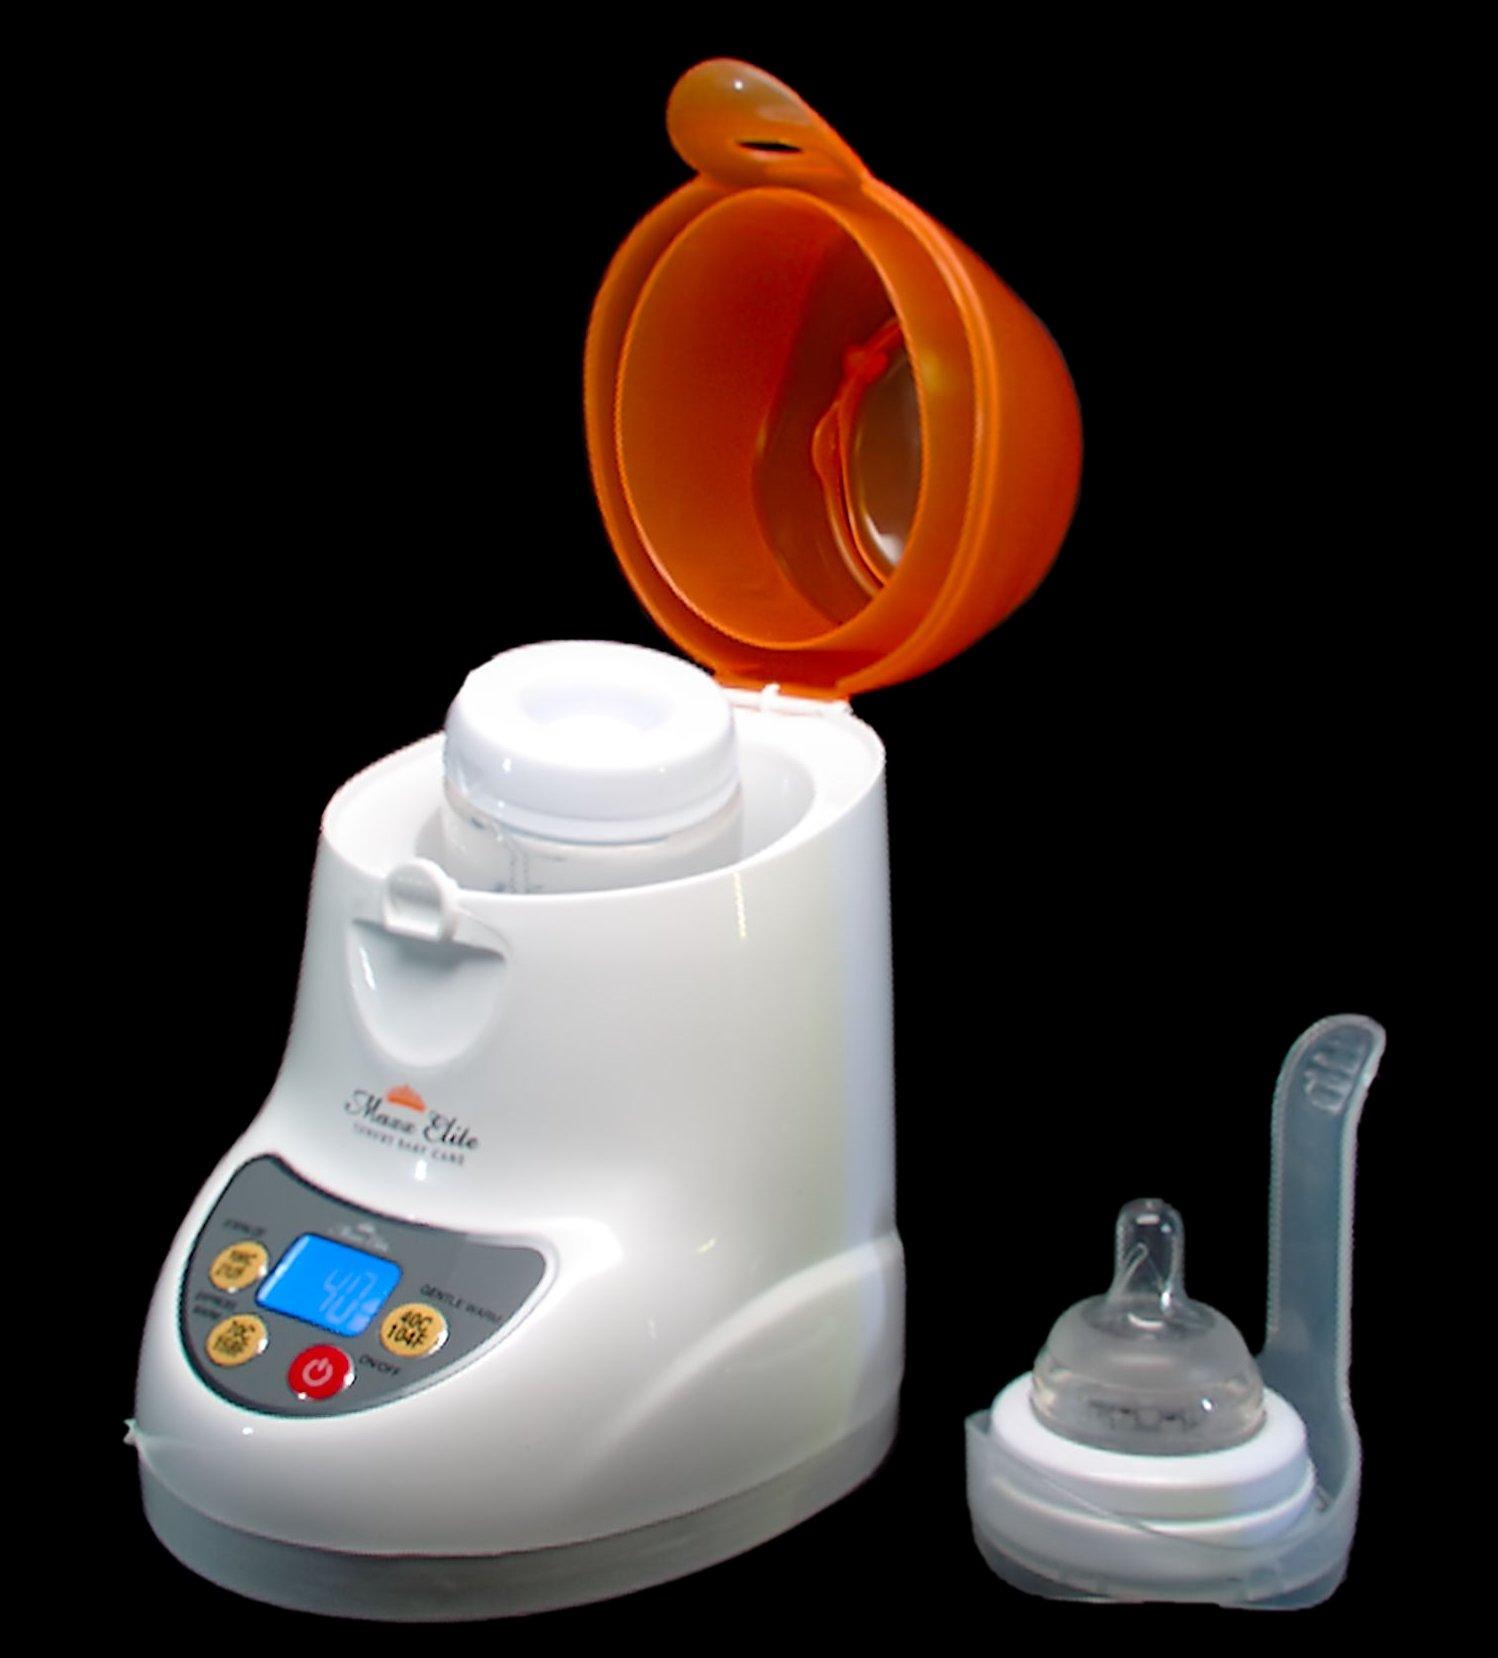 Maxx Elite ''Digital Gentle Warm'' Bottle Warmer & Sterilizer w/''Steady Warm'' and LCD Display (Orange) by Maxx Elite (Image #7)